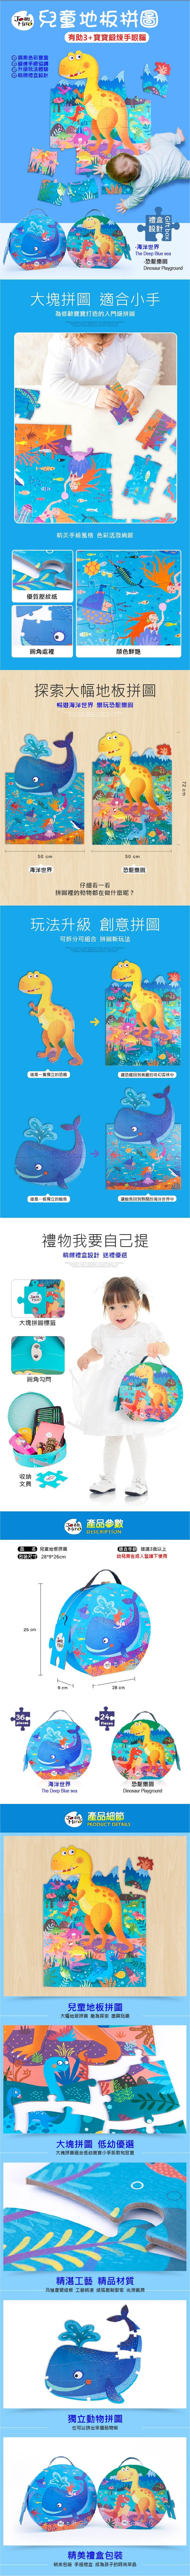 201708~JoanMiro~JM10551~兒童地板拼圖-02